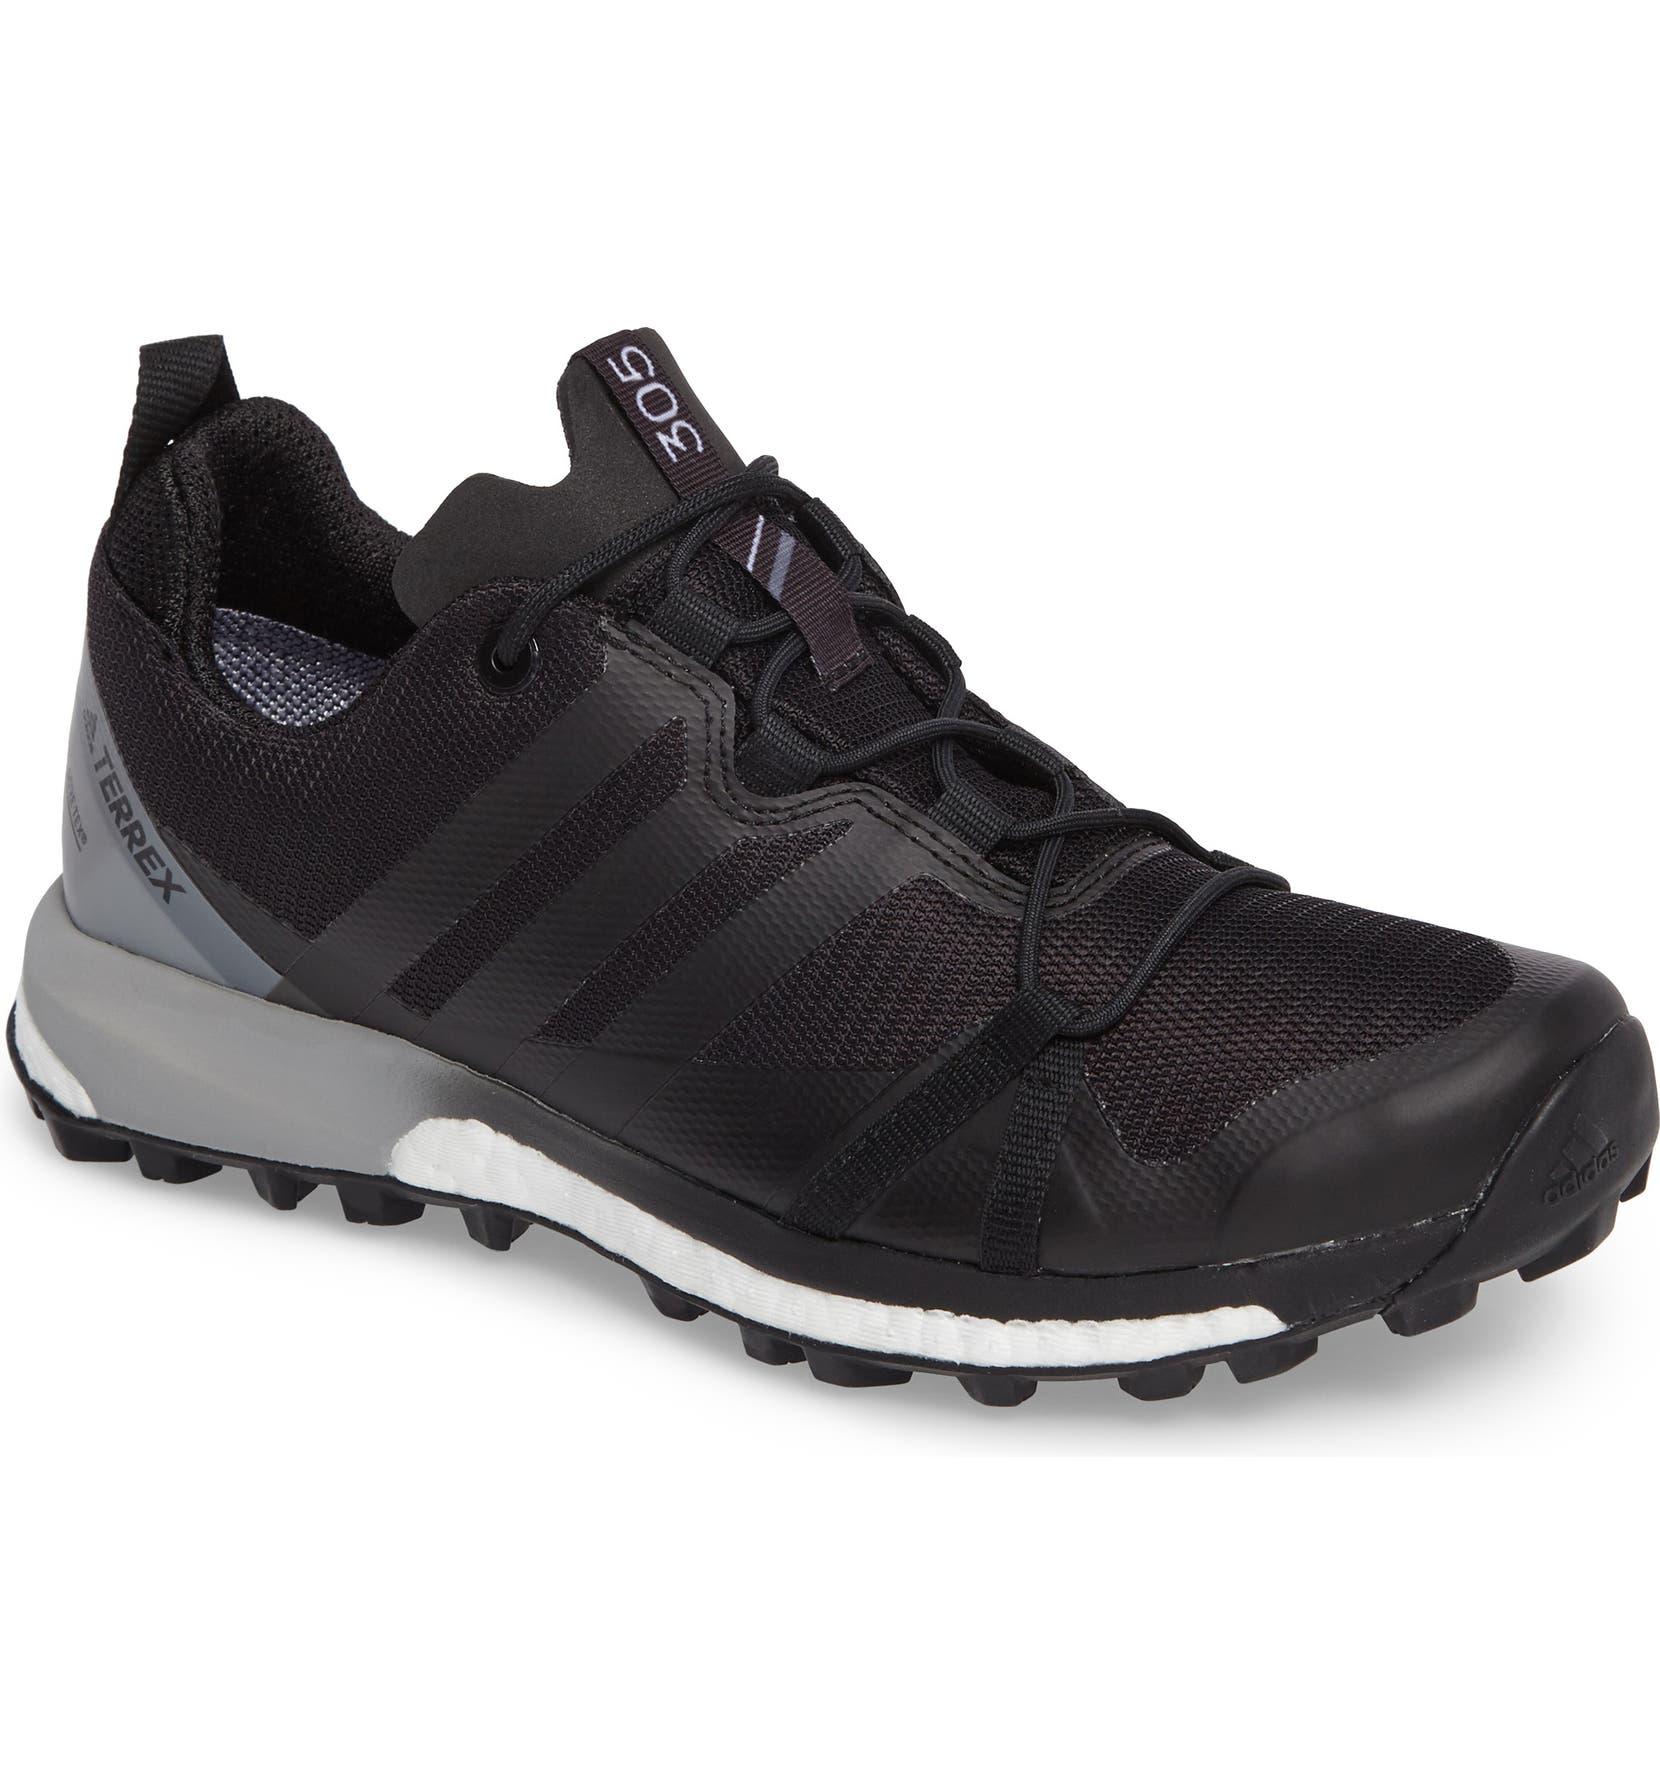 newest d5102 89600 adidas Terrex Agravic GTX Trail Shoe (Women)  Nordstrom